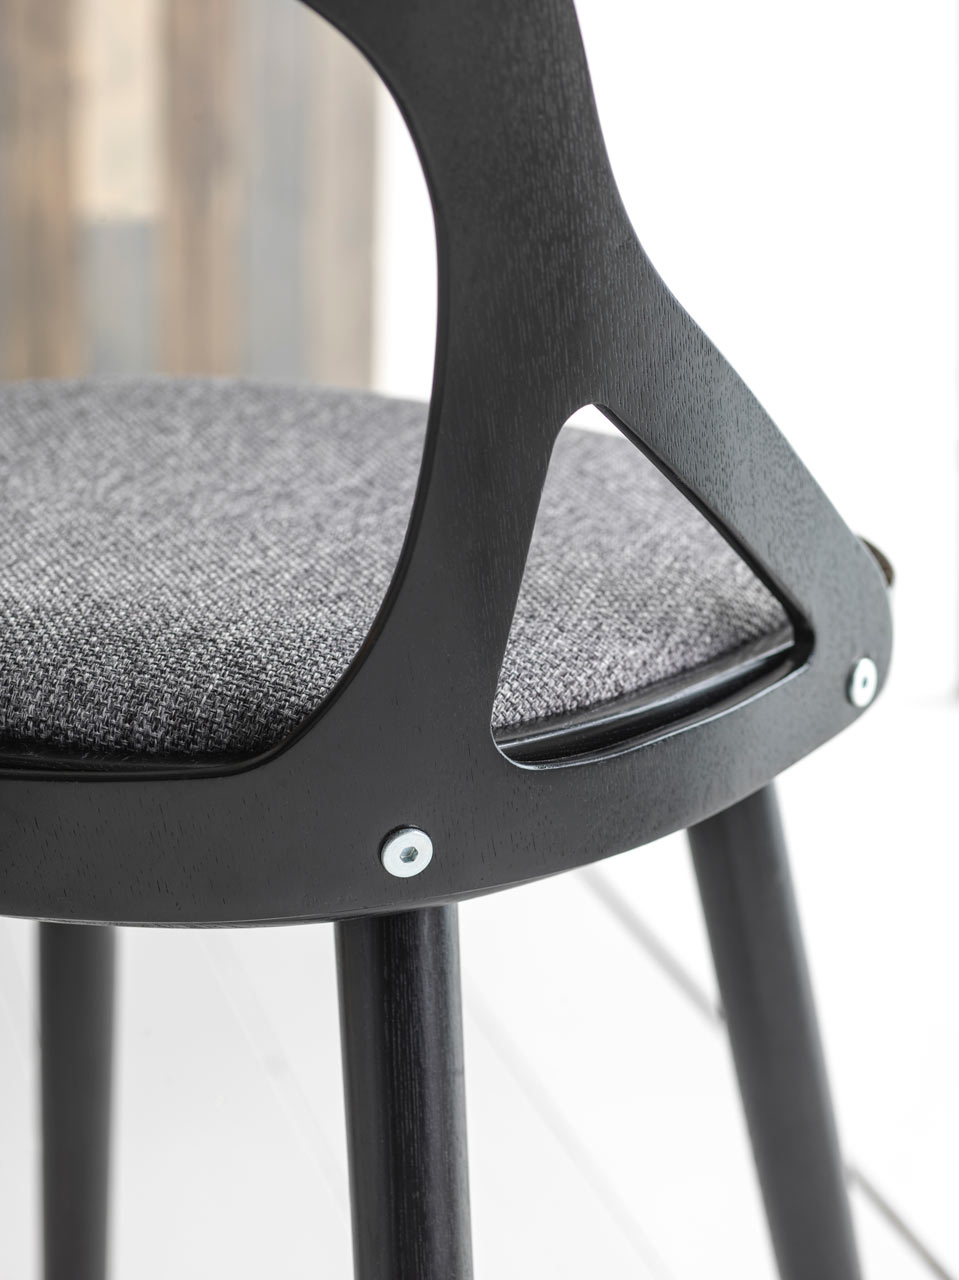 Colibri-Chair-Markus-Johansson-HansK-6